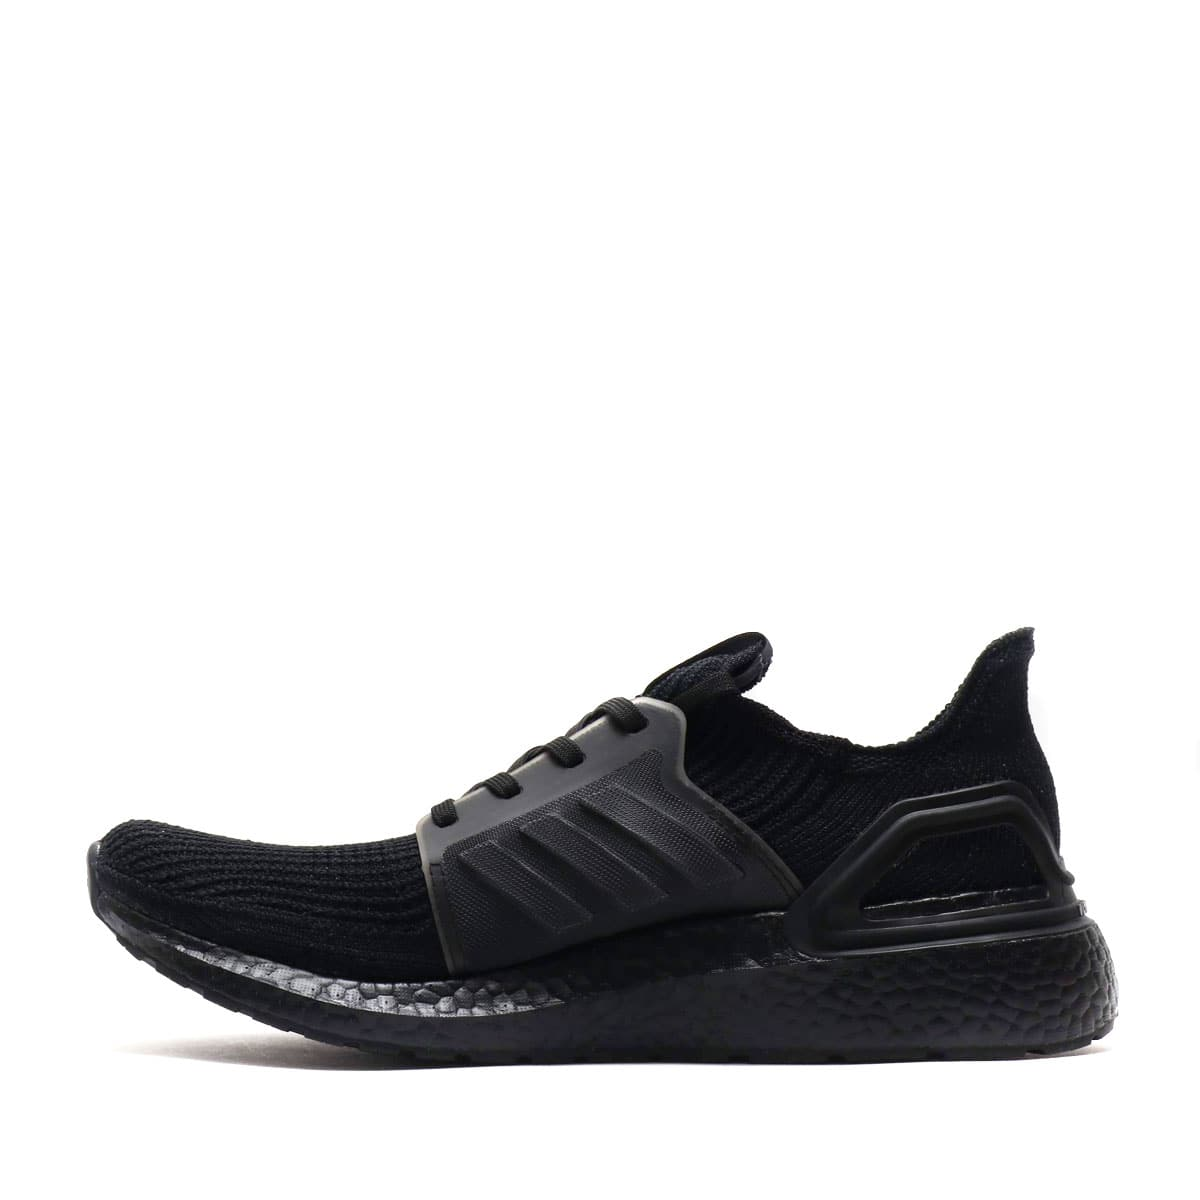 """adidas UltraBOOST 19 CORE BLACK/CORE BLACK/CORE BLACK 19FW-I""_photo_3"